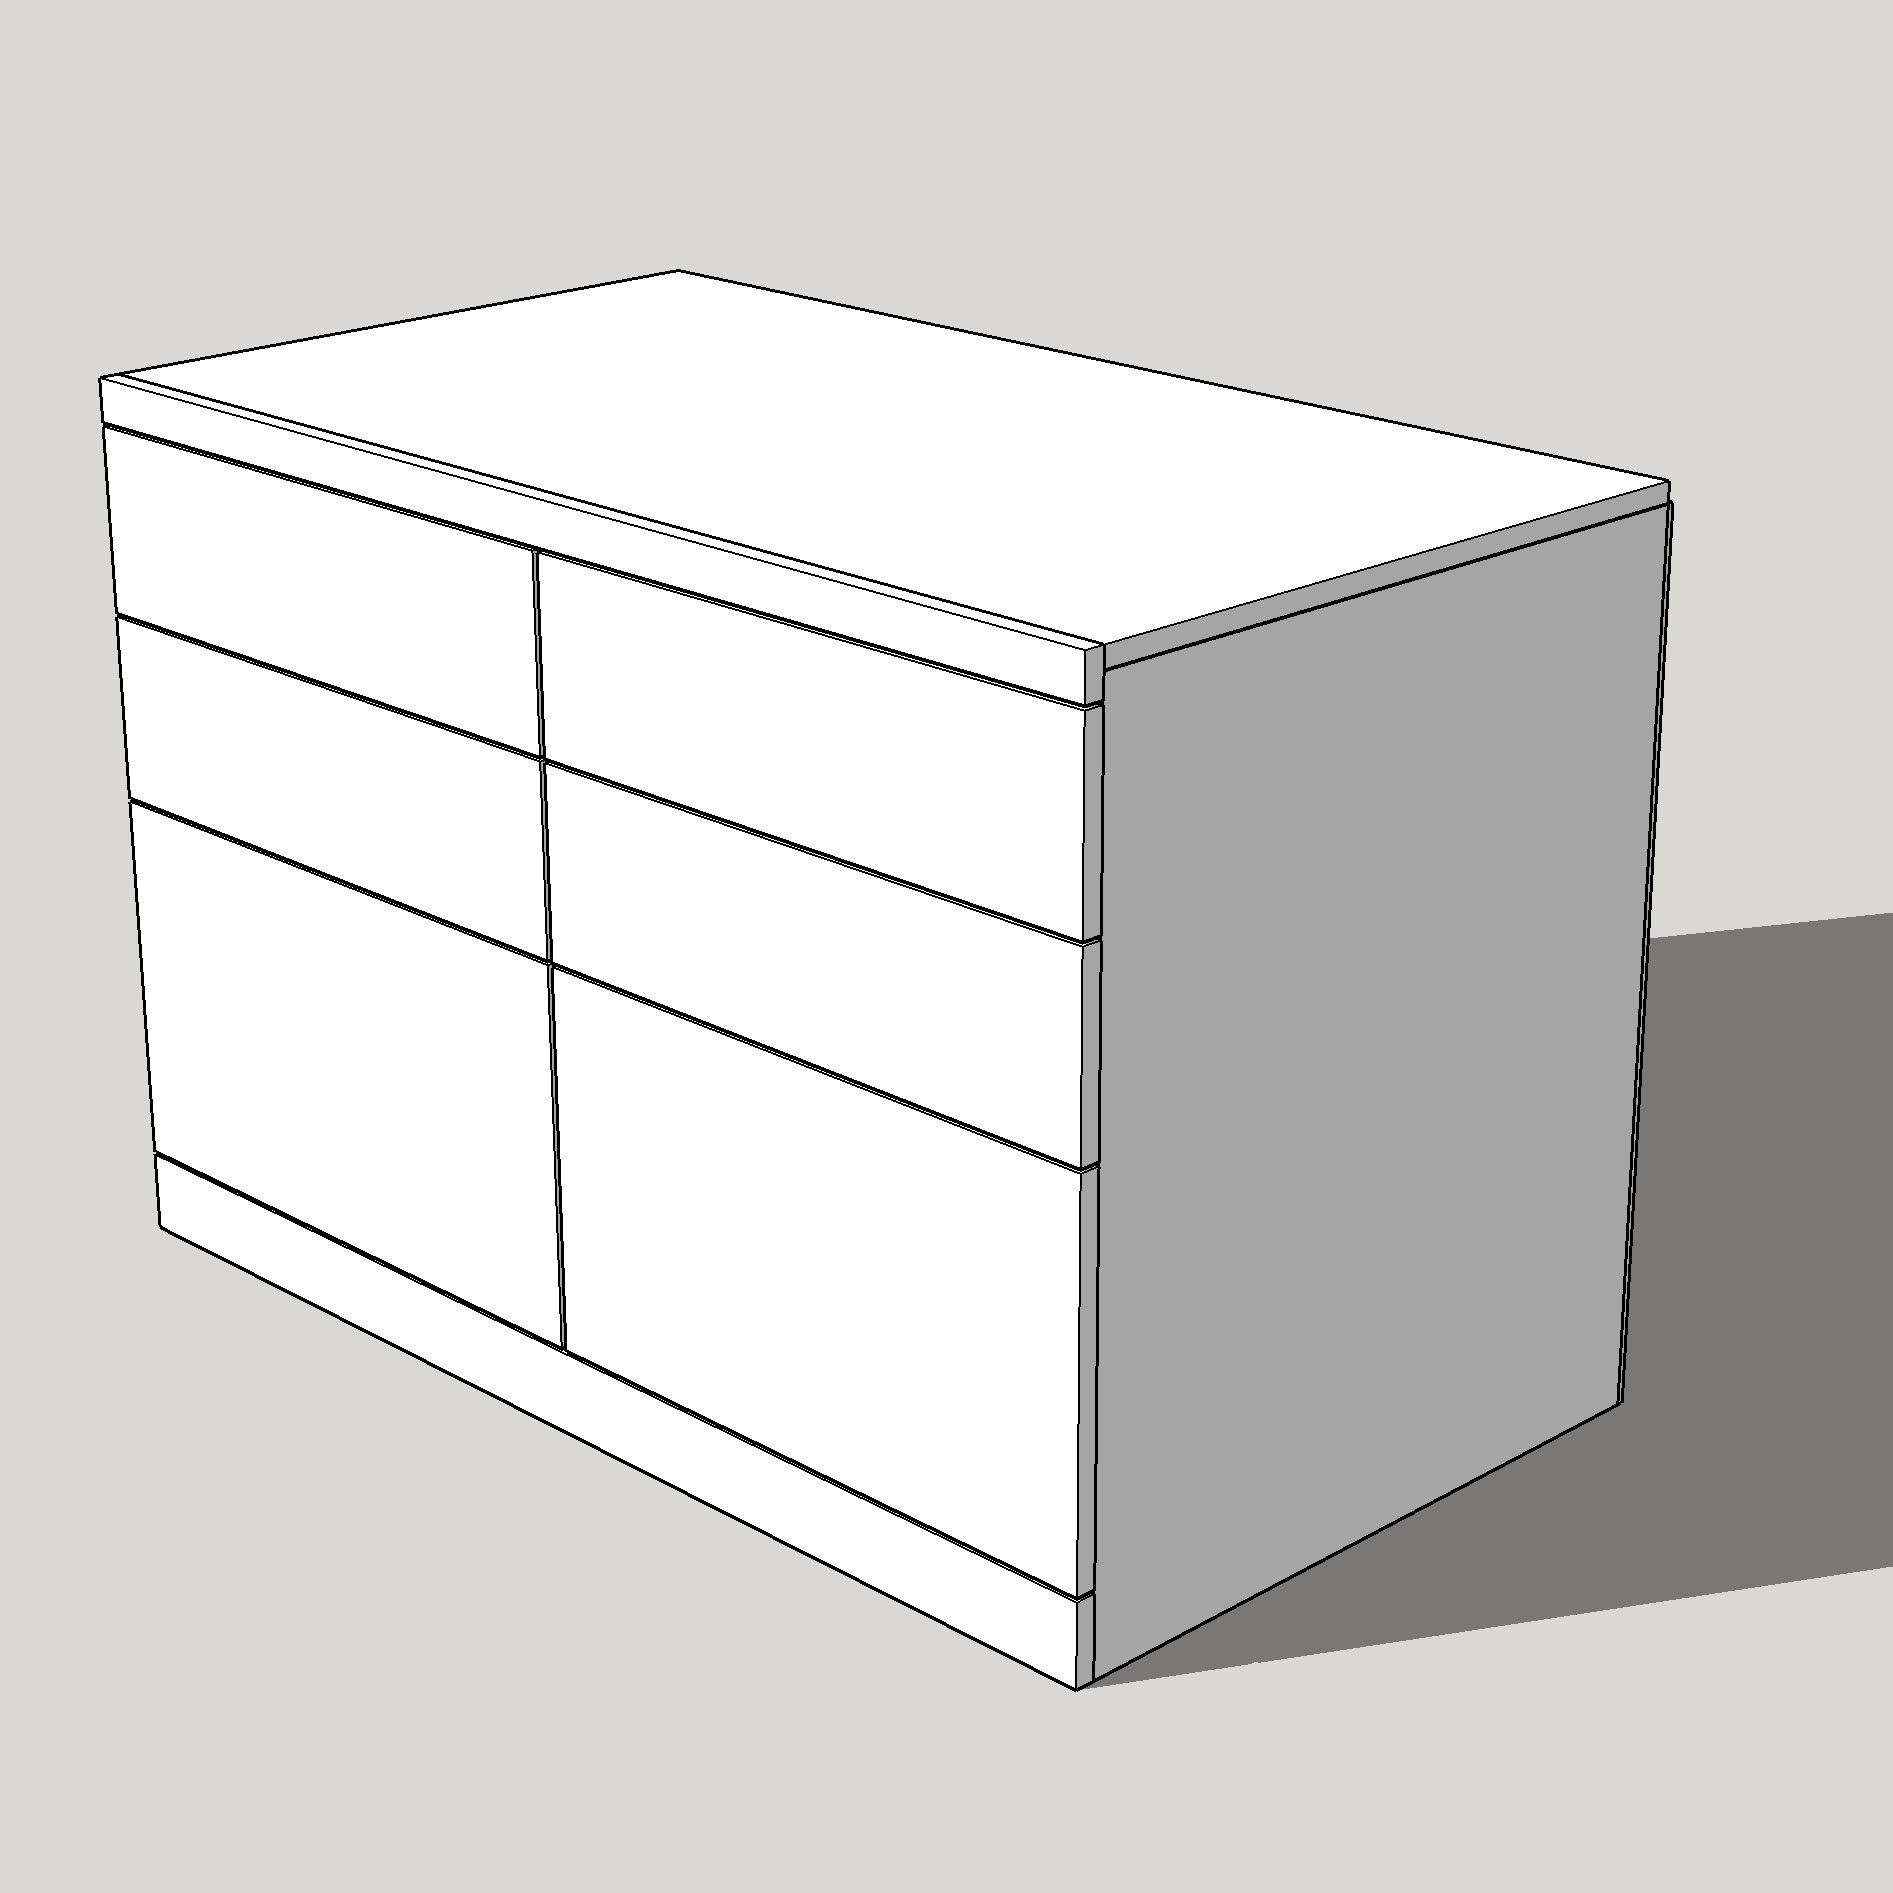 DIY CNC Table Tool Storage Cabinet plans